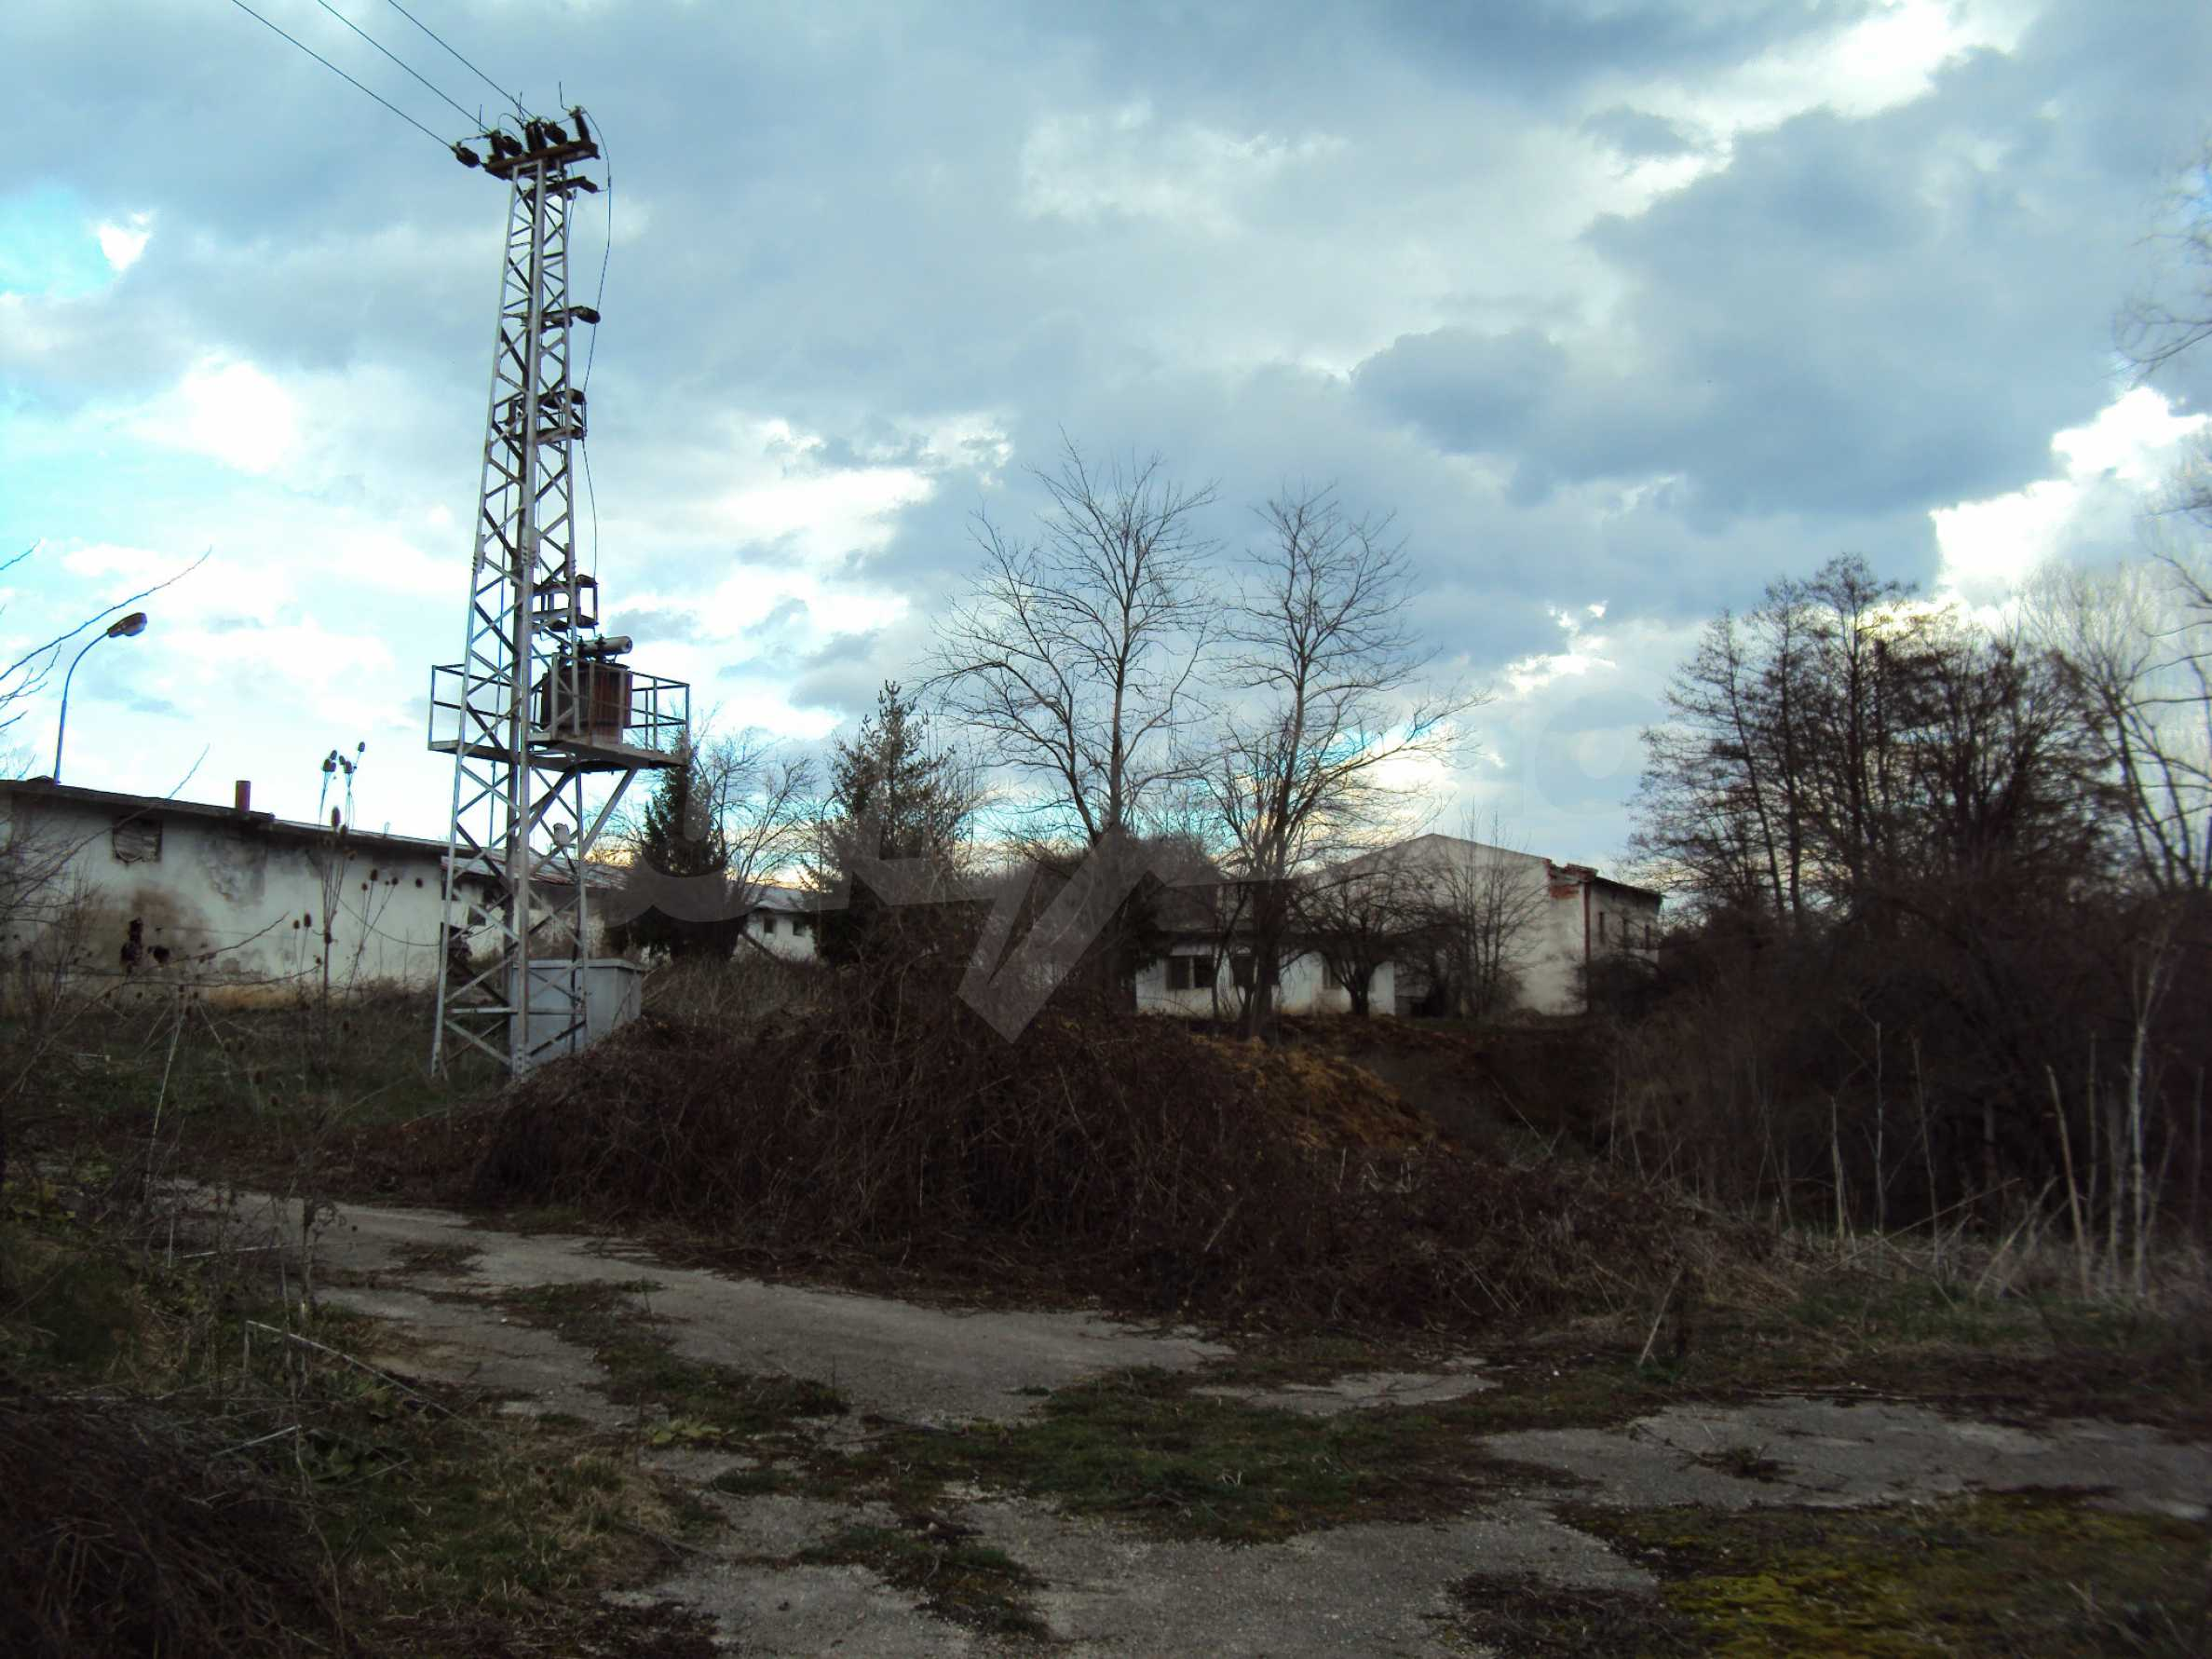 Farm in a small town 24 km from Veliko Tarnovo 20